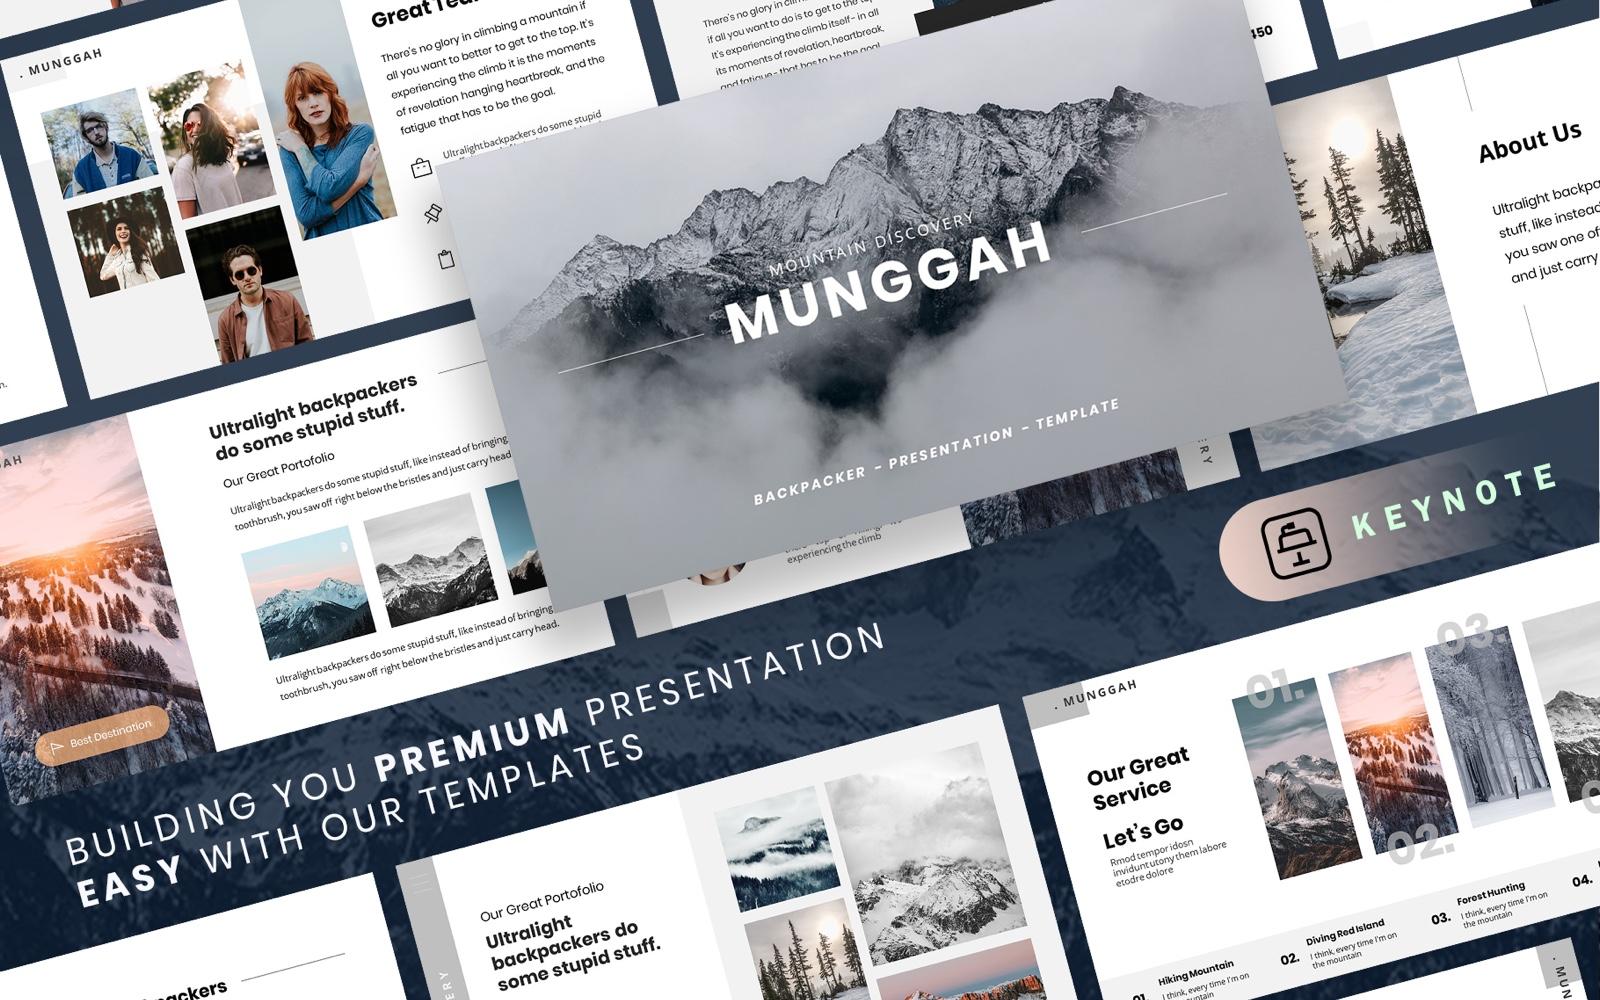 MUNGGAH - Outdoor Adventure Keynote Template